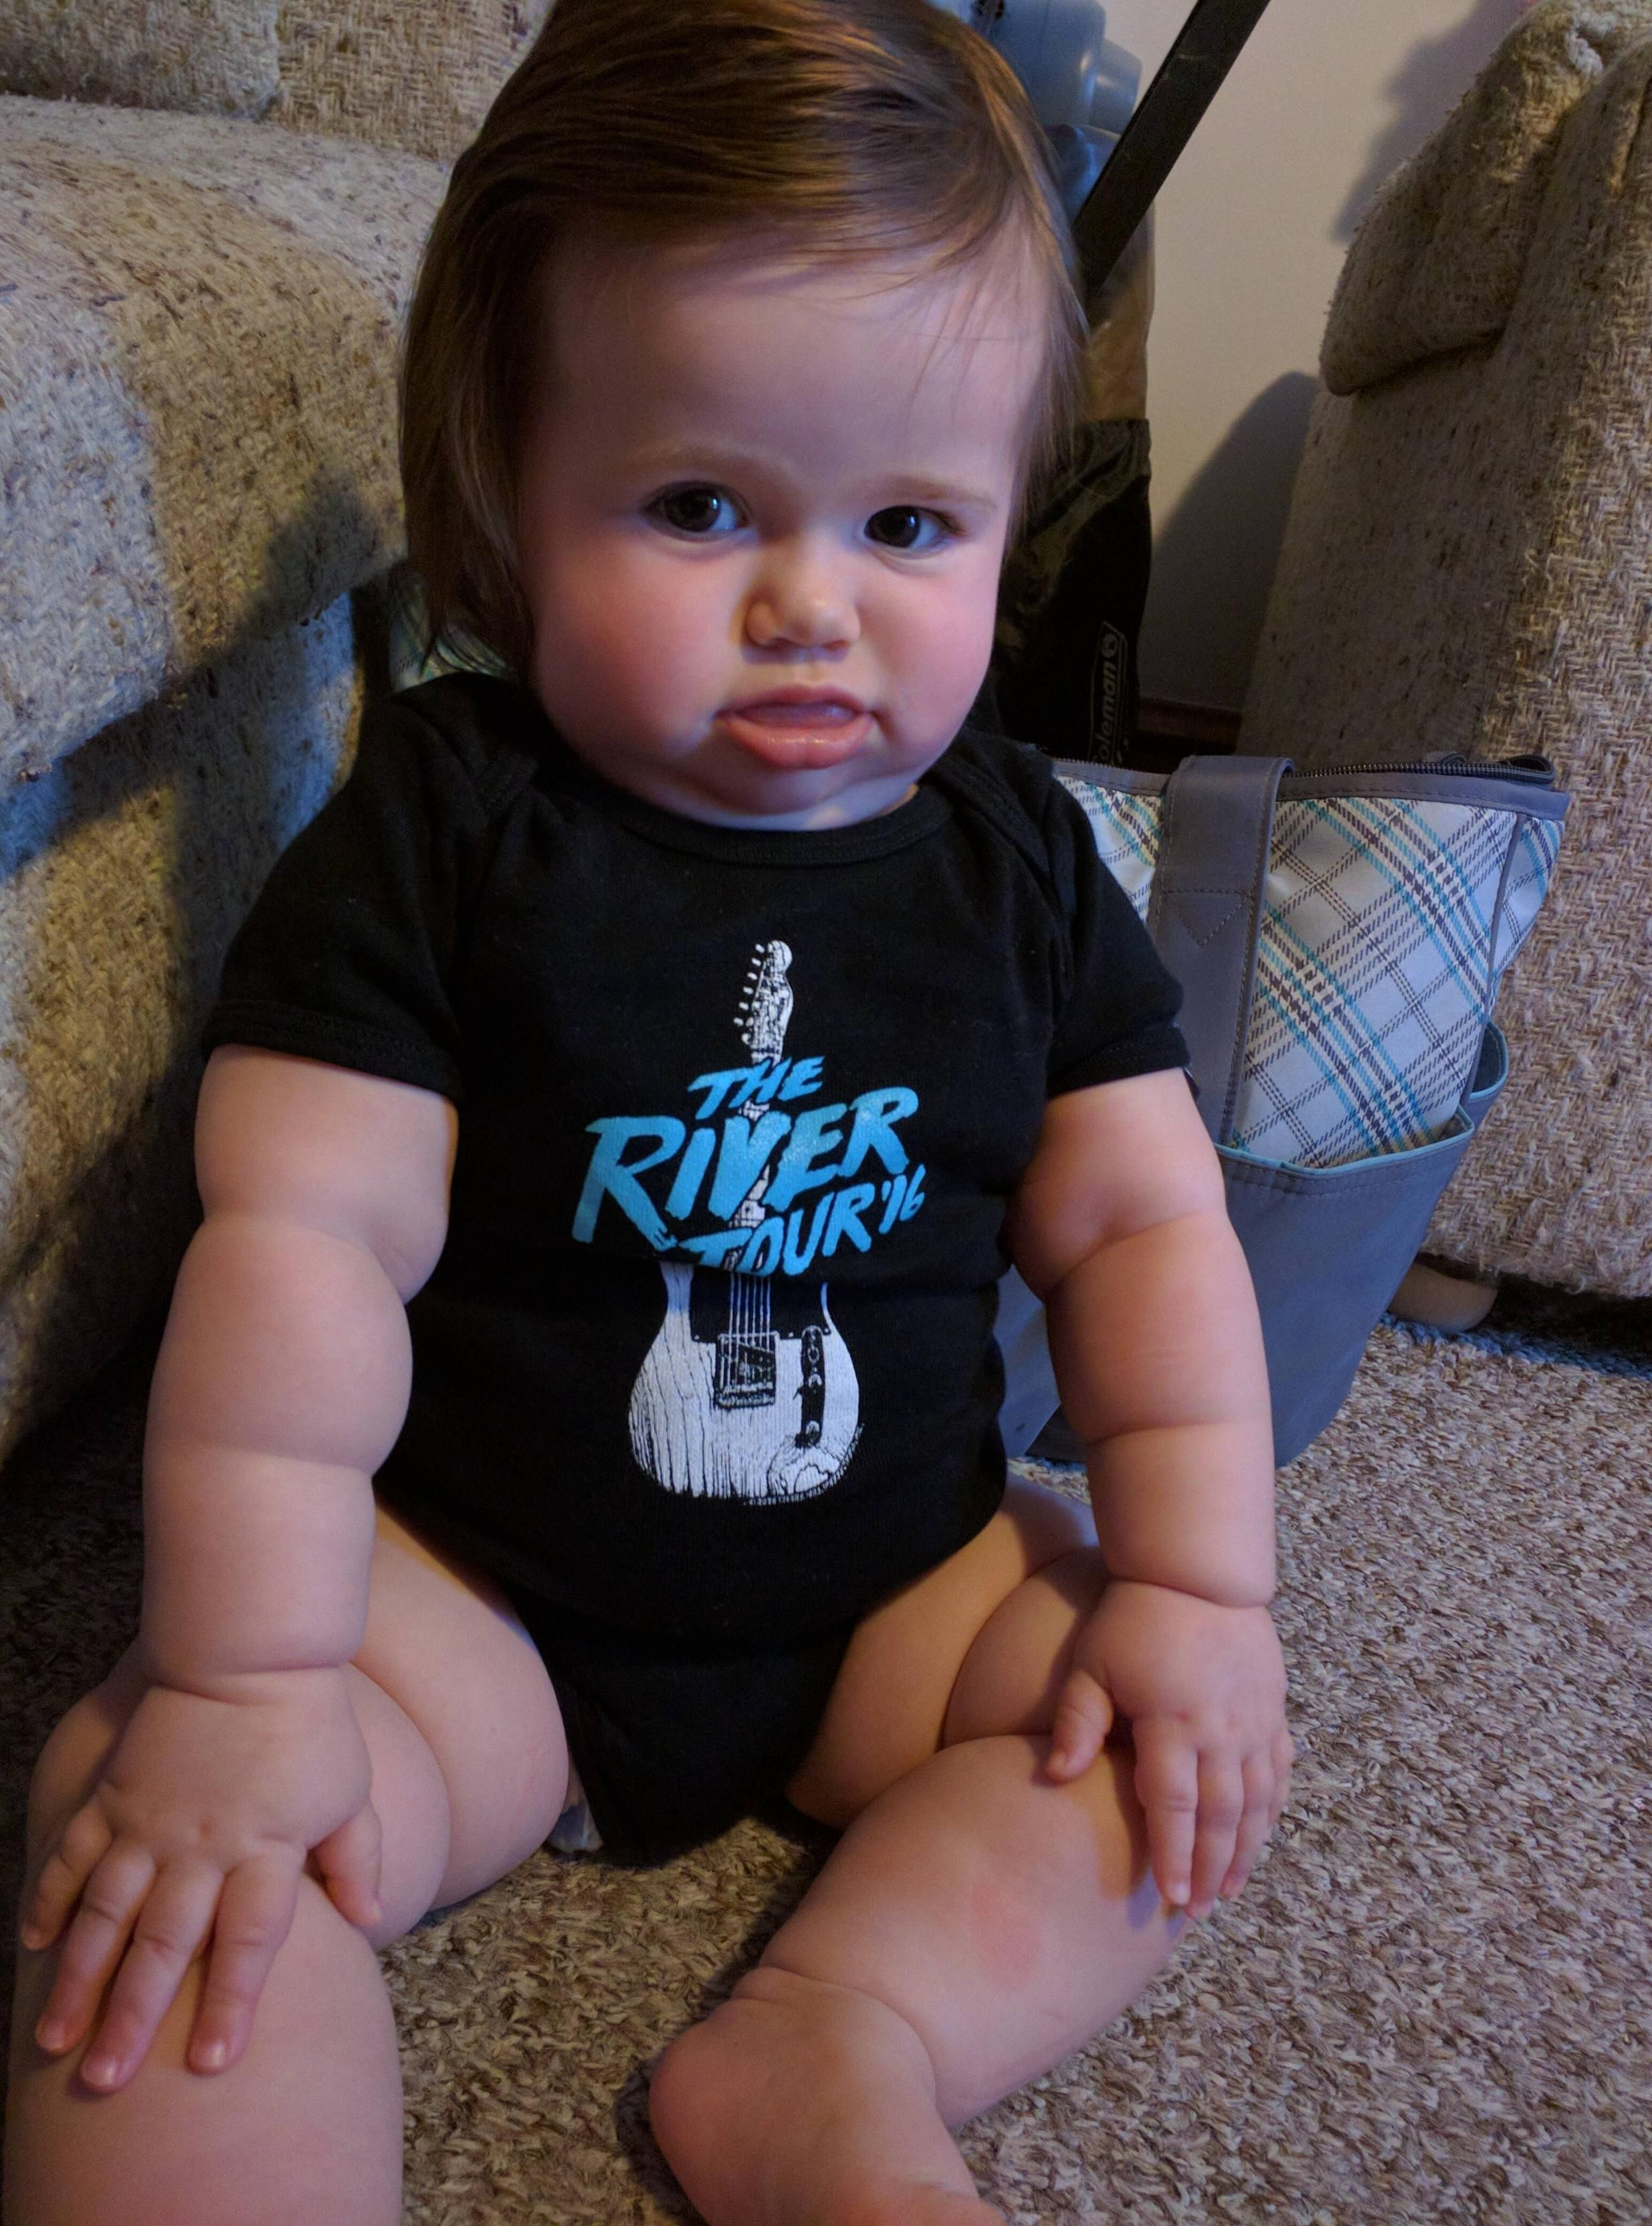 Grumpy babies? Here's Mara in her Springsteen onesie grandma got her. #daddy #love #family #dad #daughter #baby